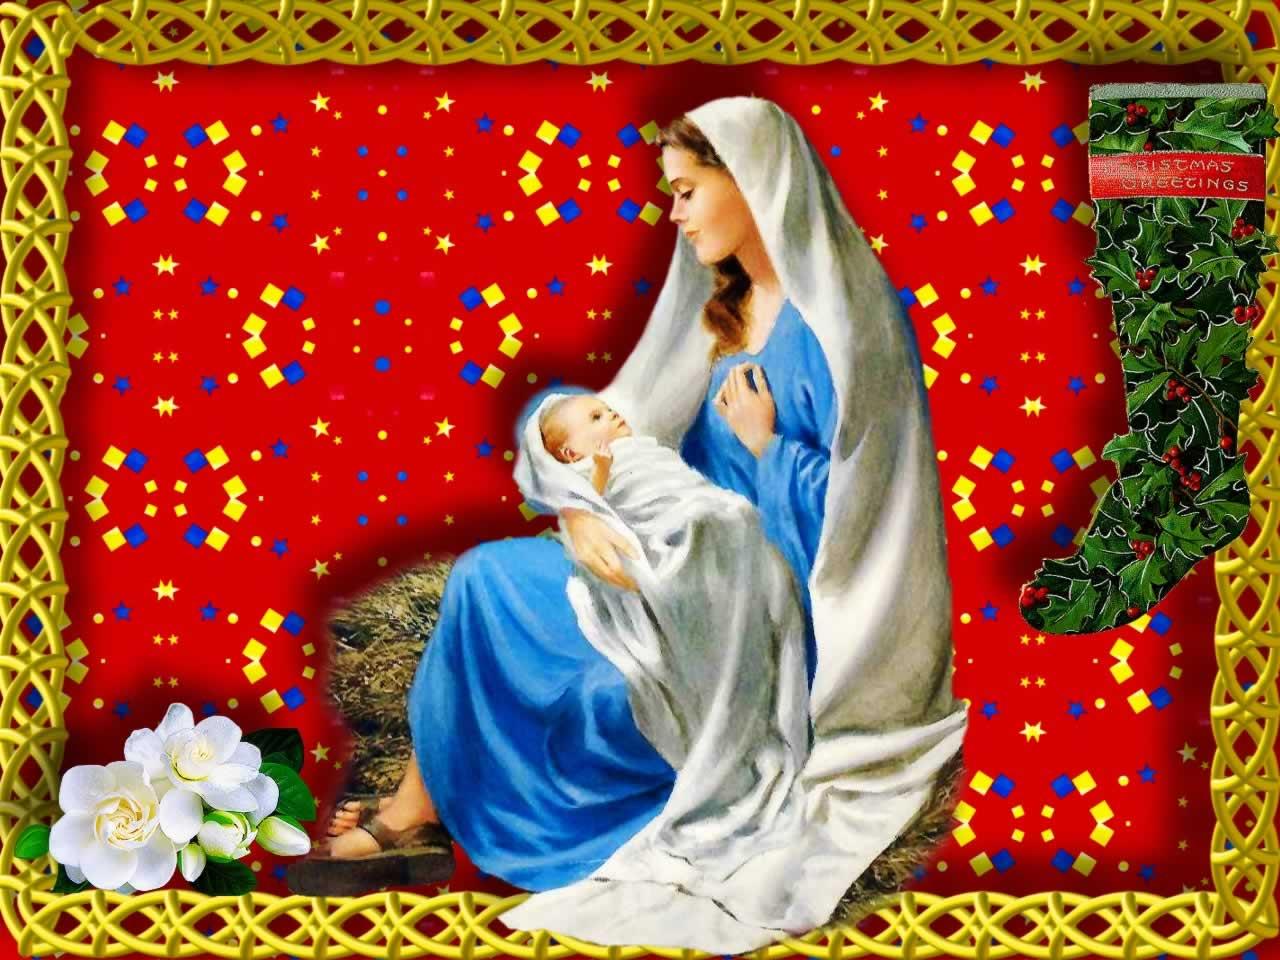 Holy Mother Mary - Christmas Nativity